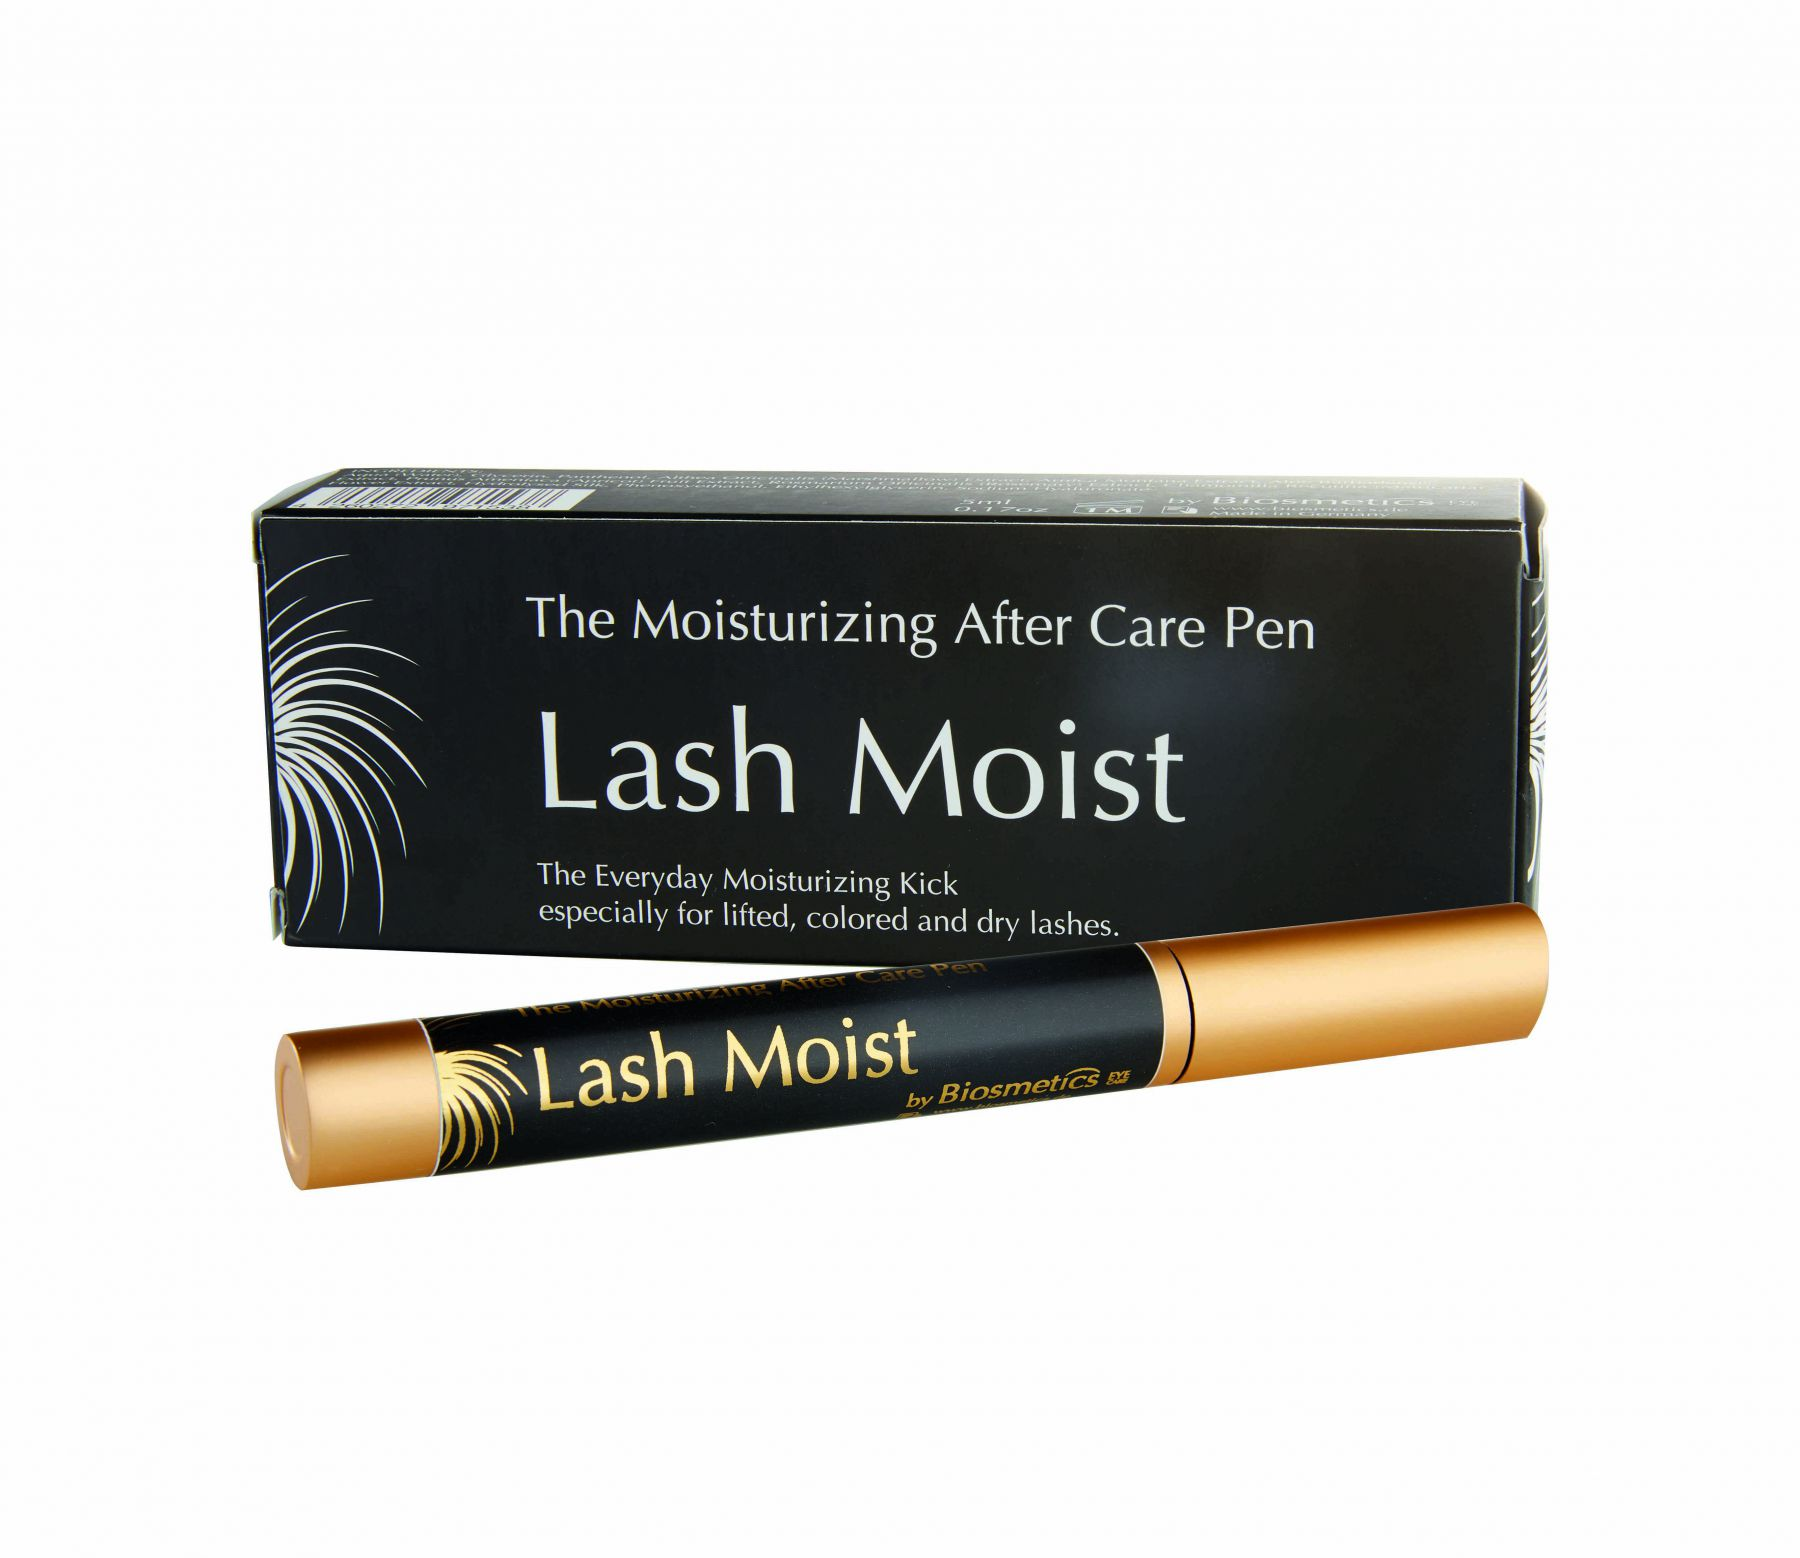 Biosmetics Lash Moist